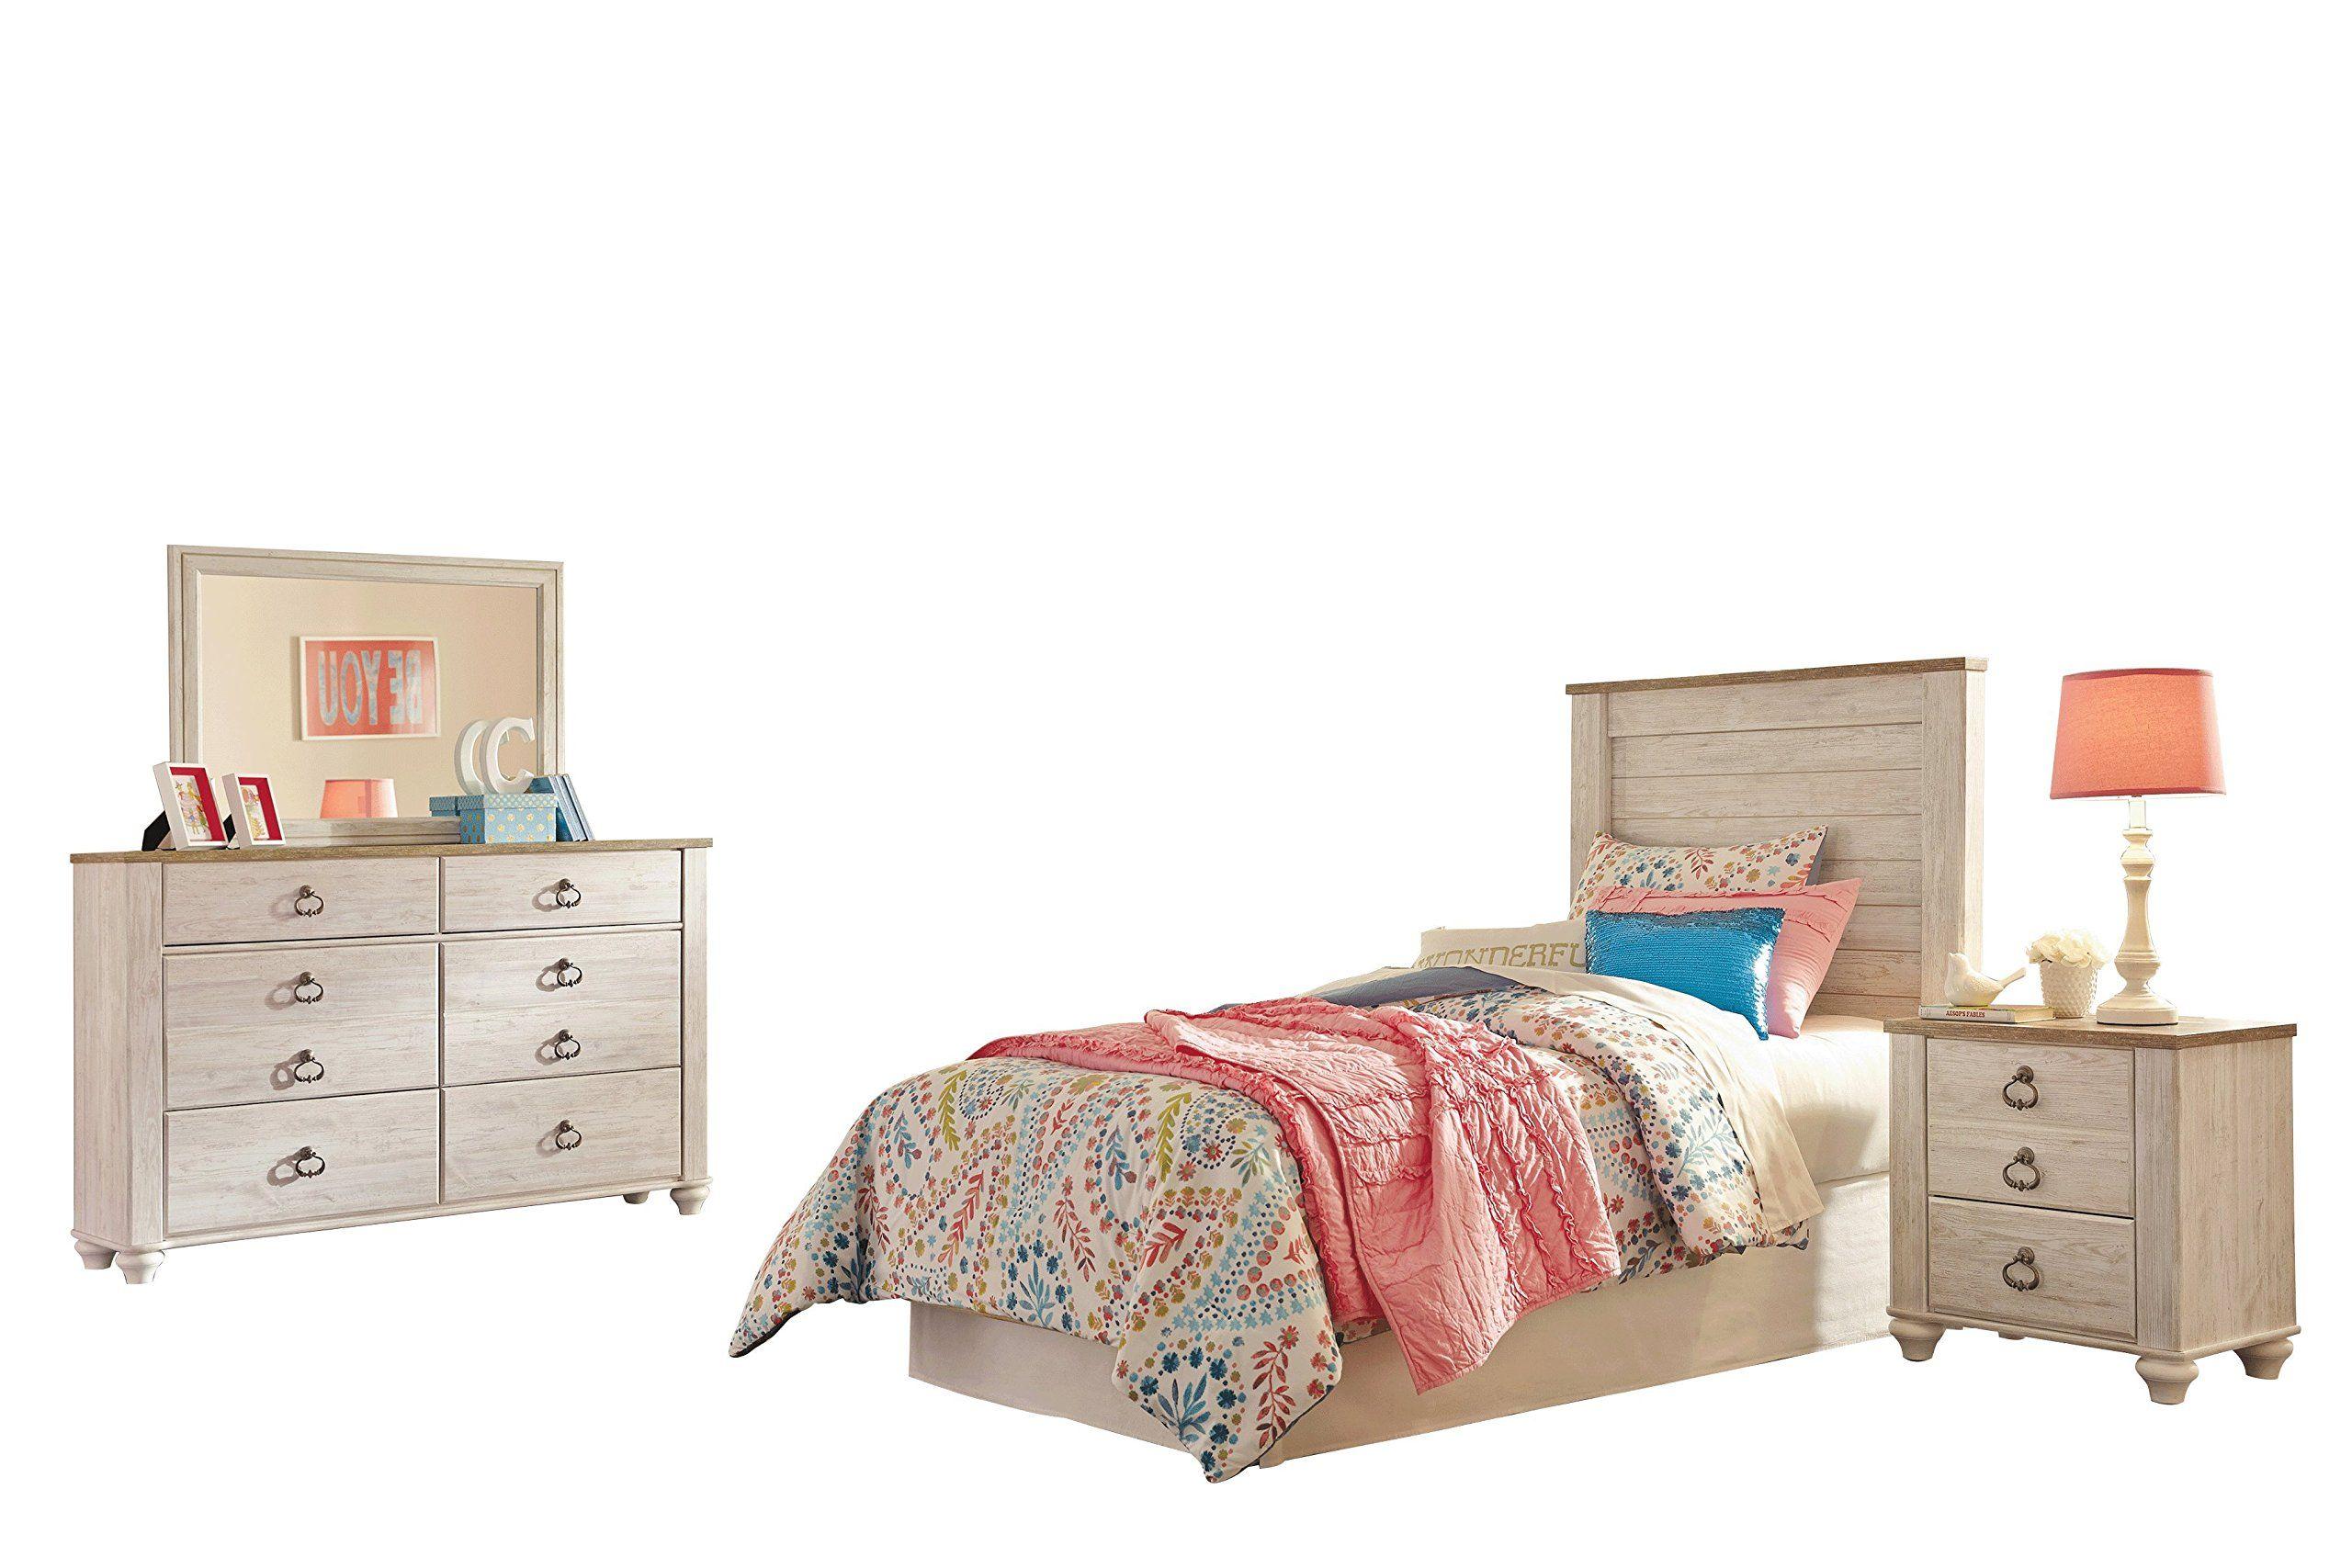 Ashley Willowton 4PC Full Panel Headboard Bedroom Set In